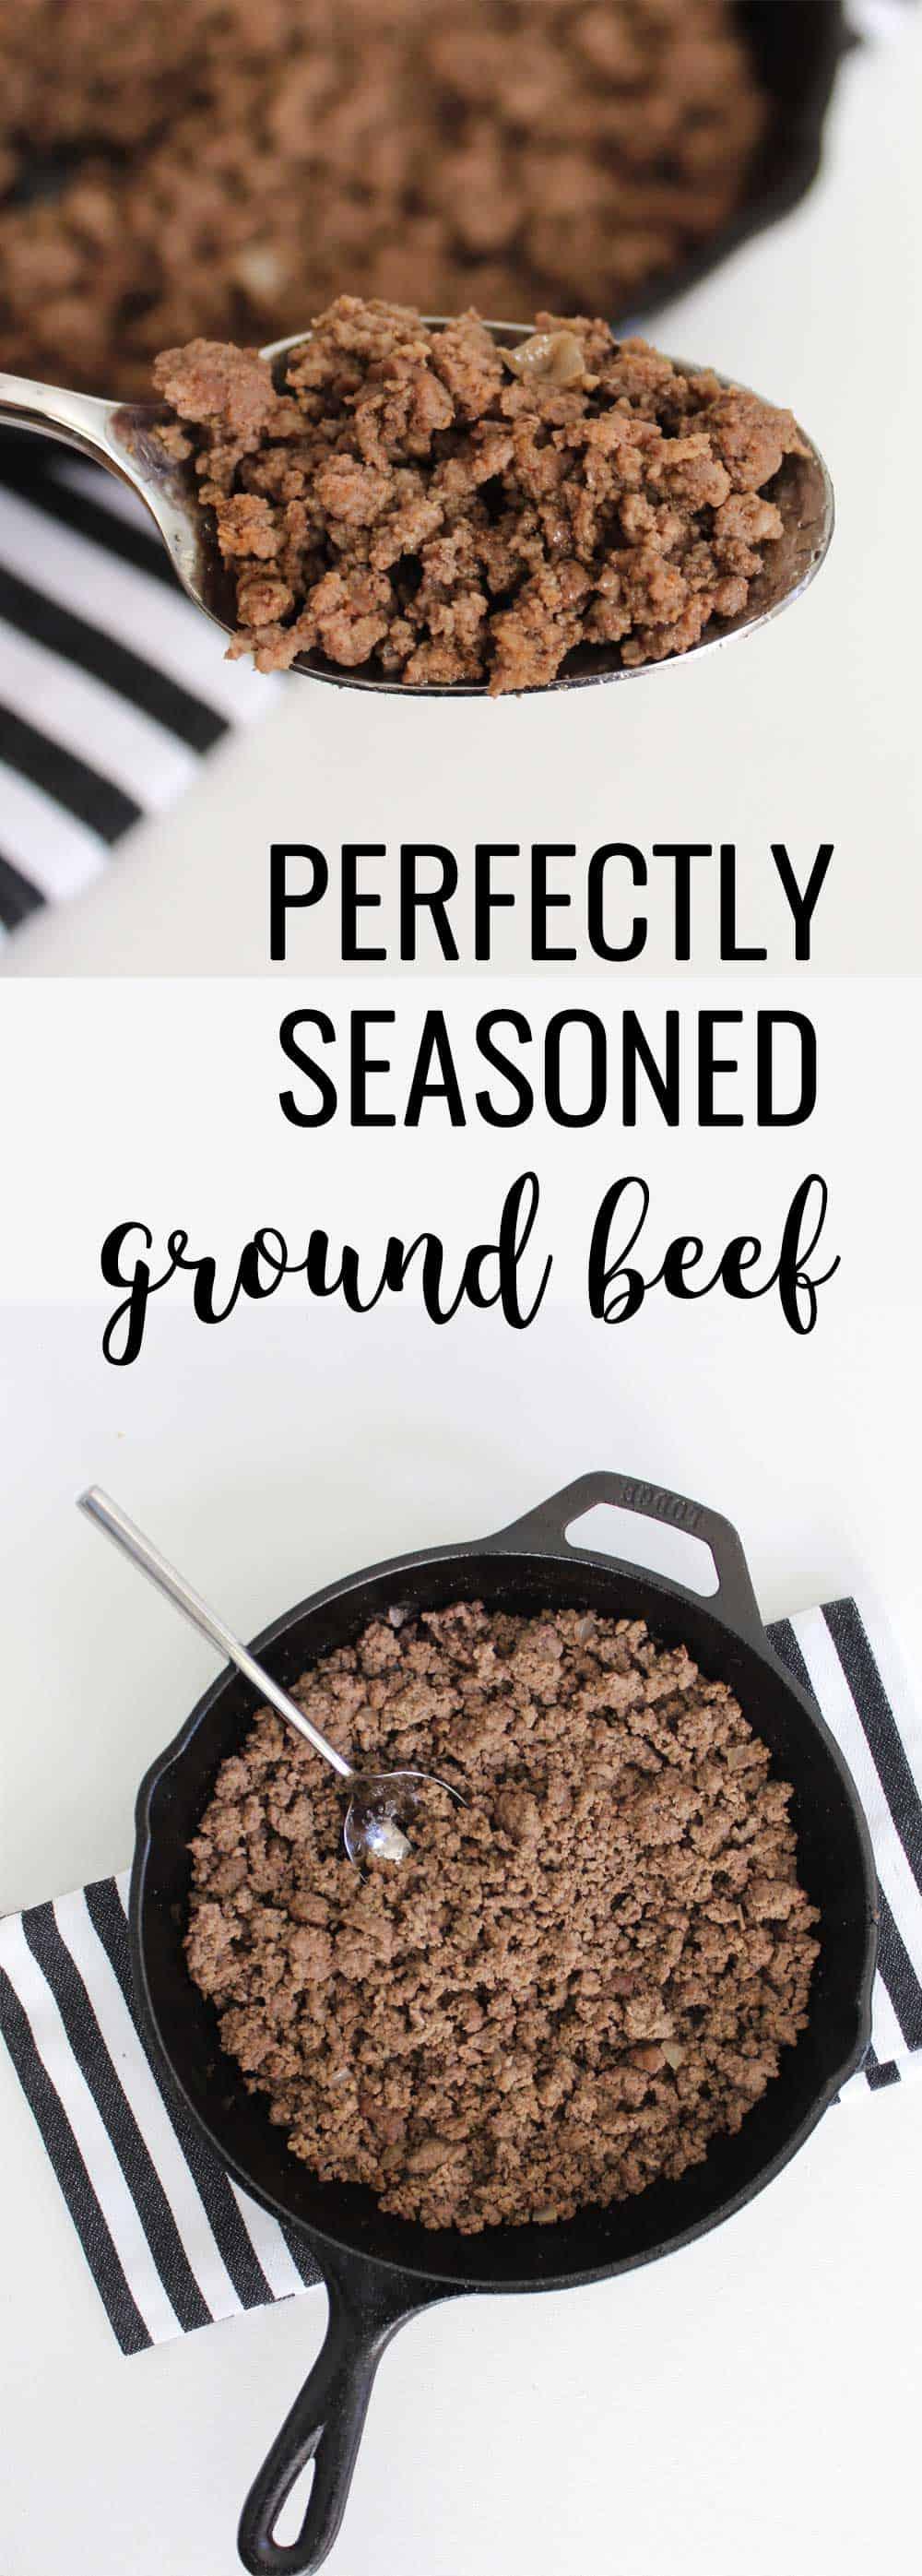 Perfectly Seasoned Ground Beef